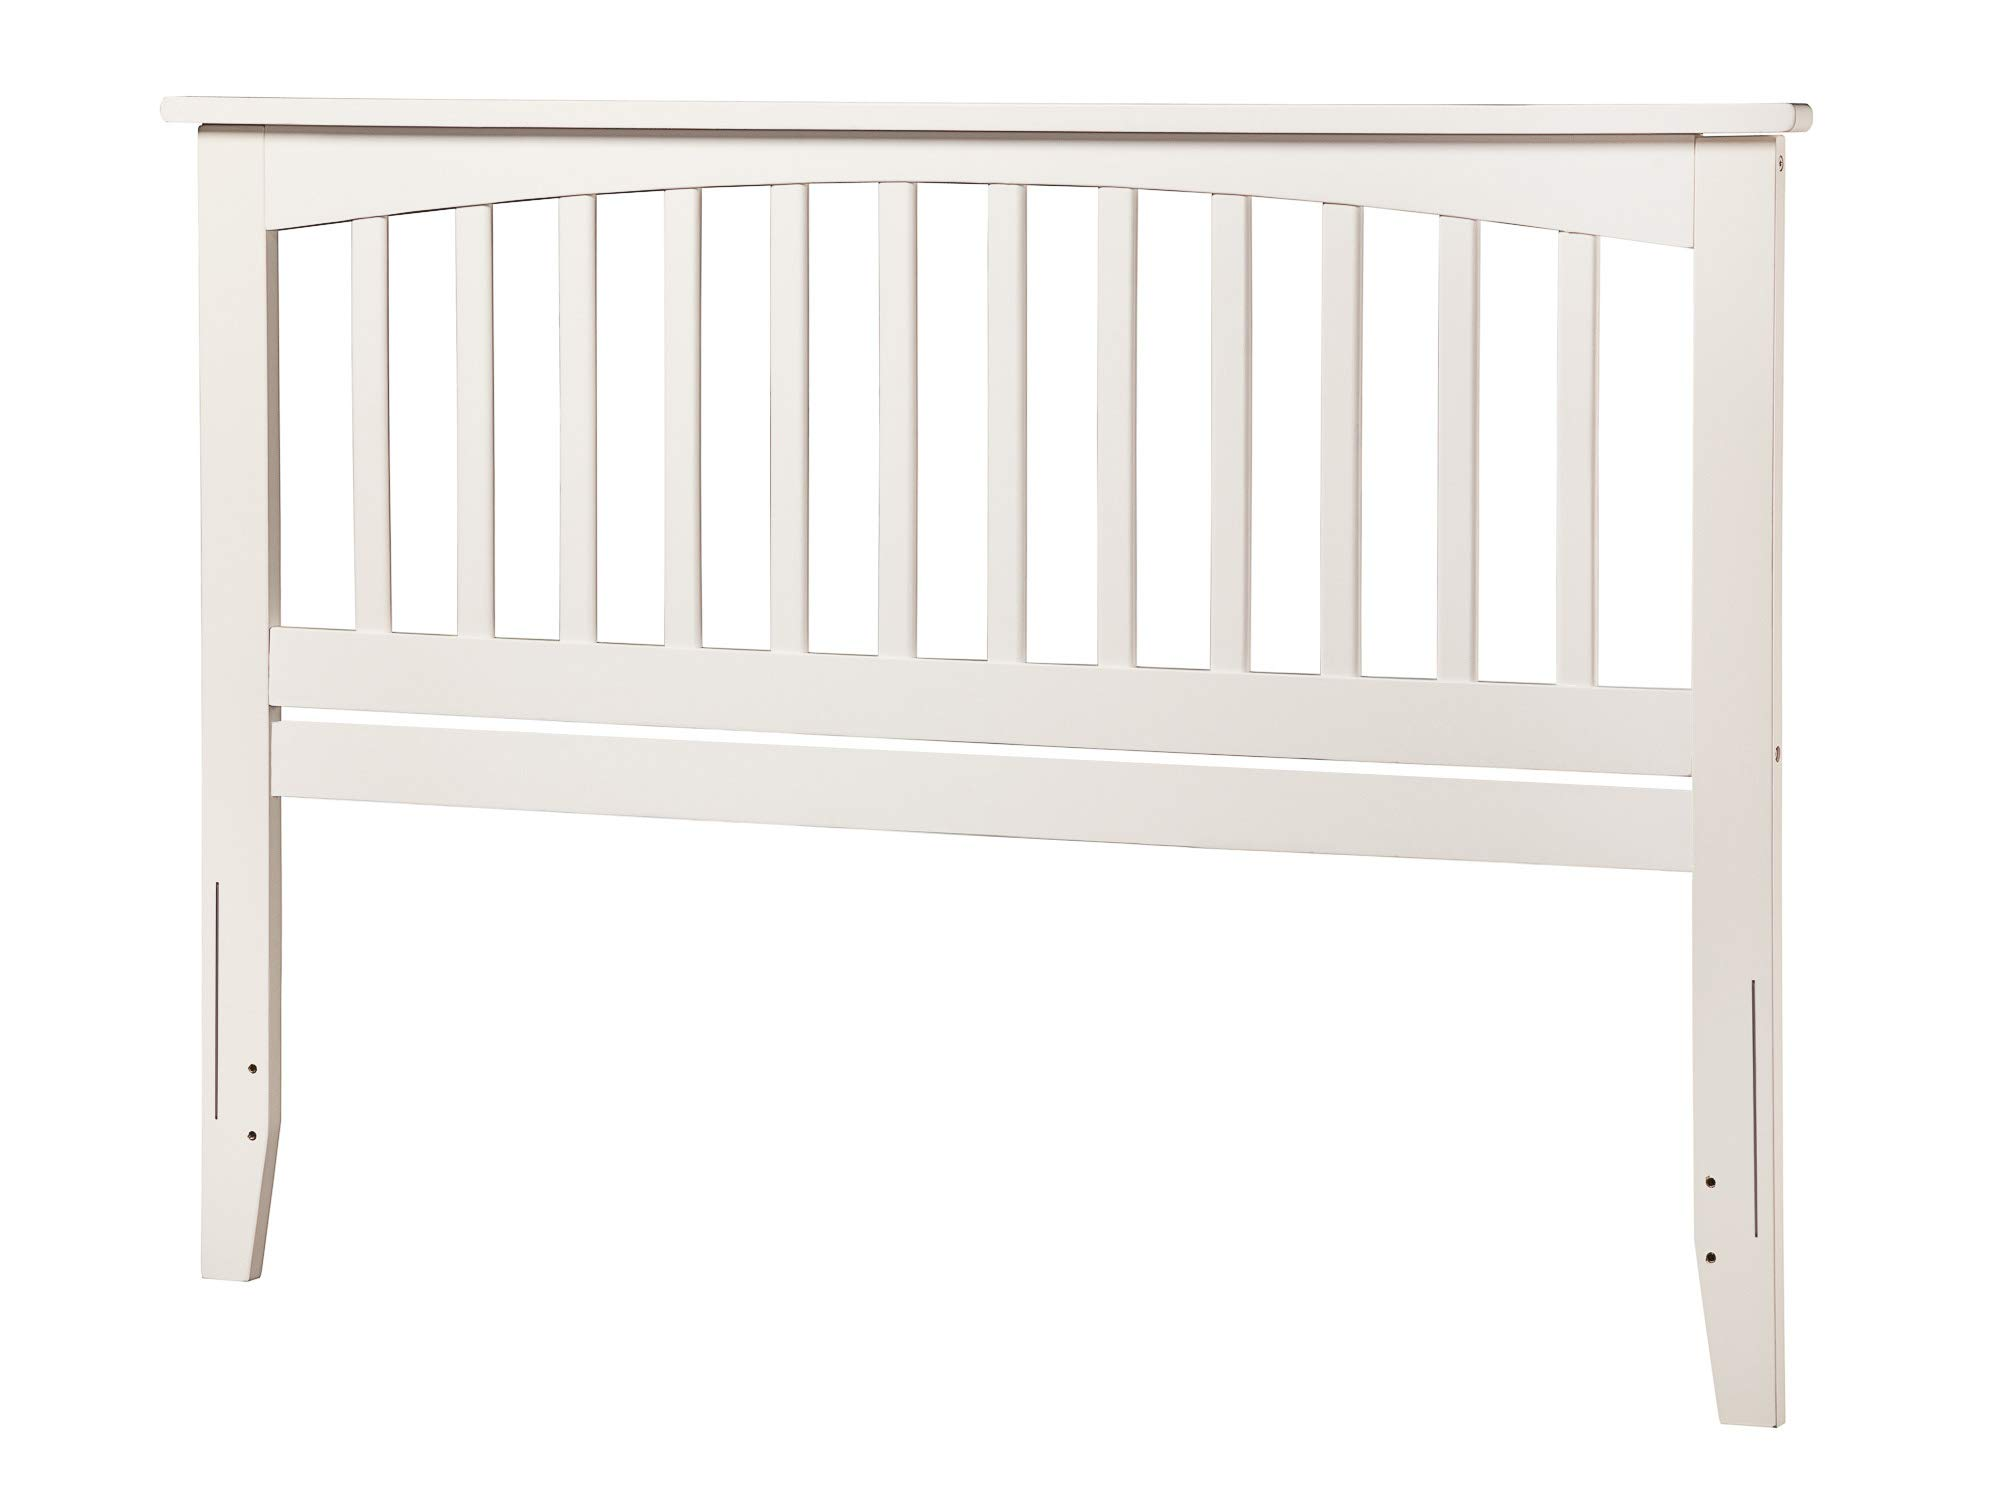 Atlantic Furniture AR287842 Mission Headboard, Queen, White